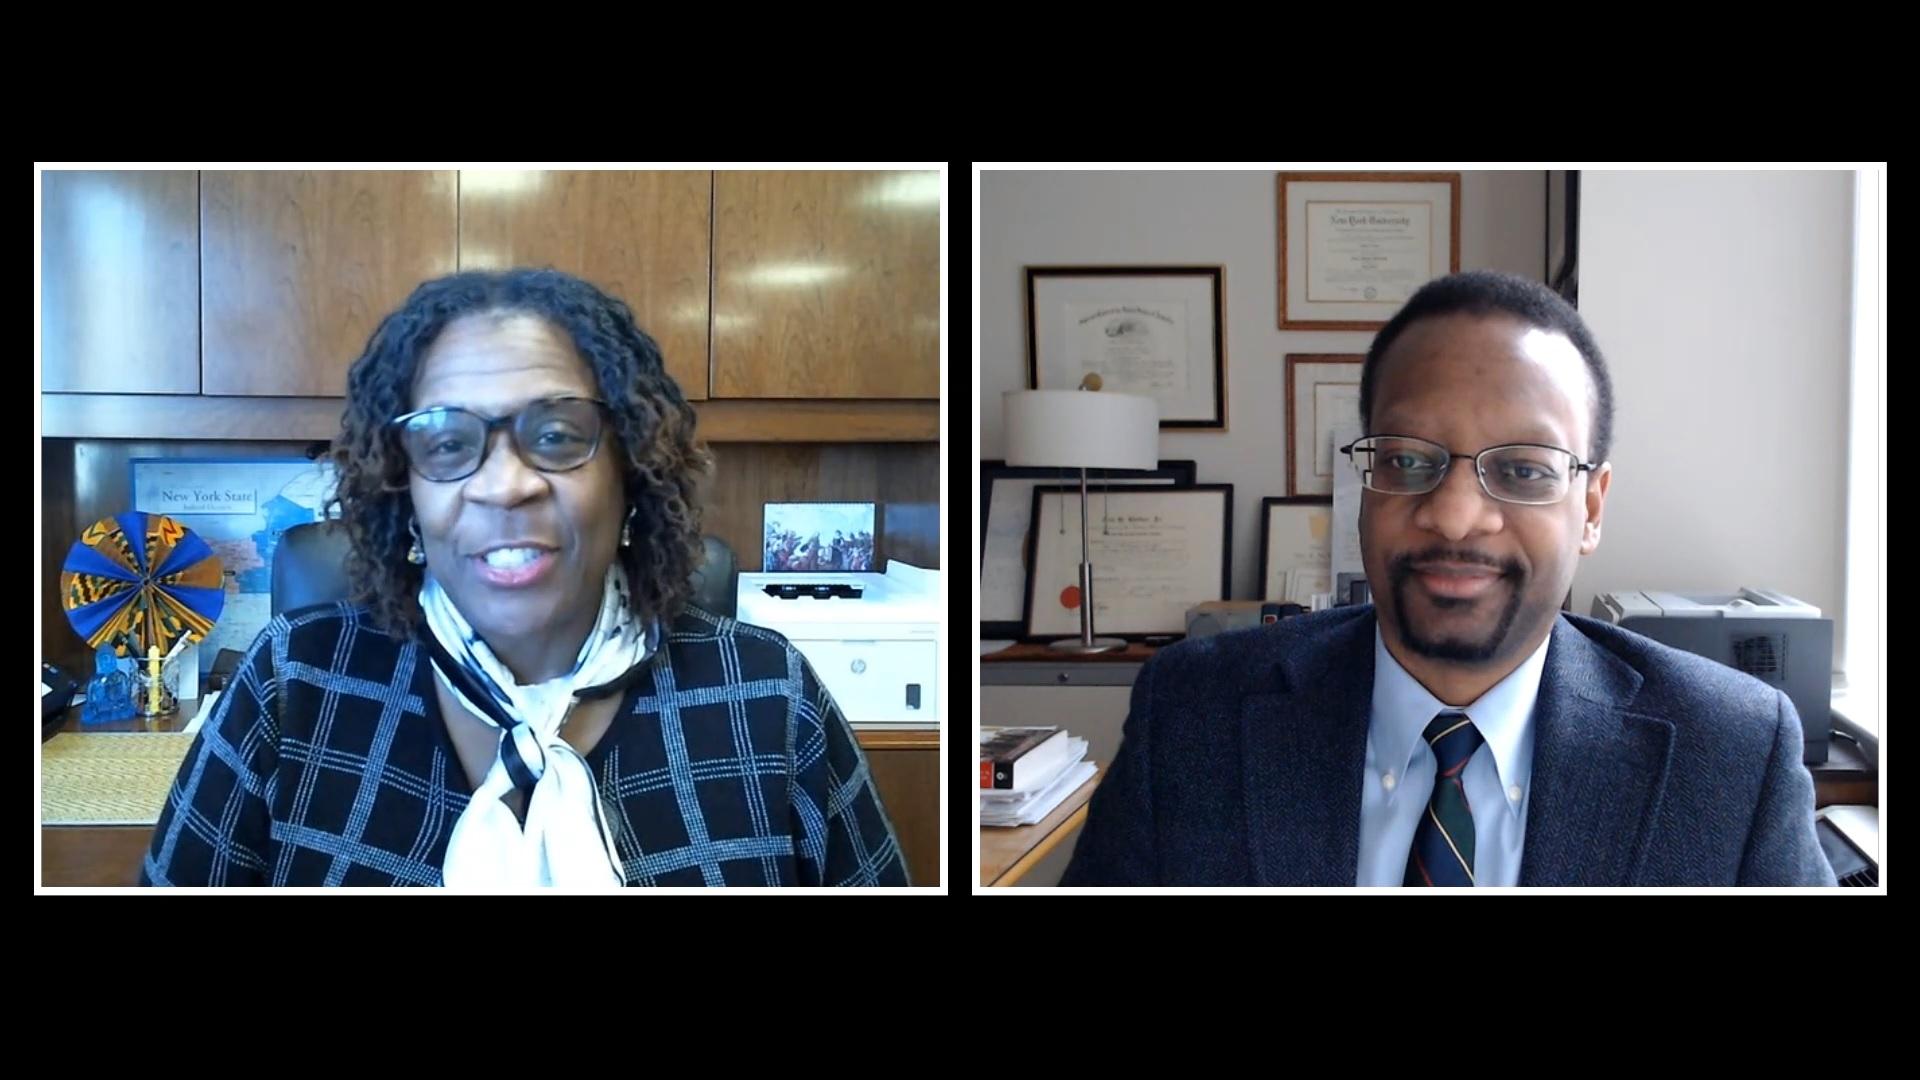 Hon. Edwina Mendelson & Prof. Troy McKenzie